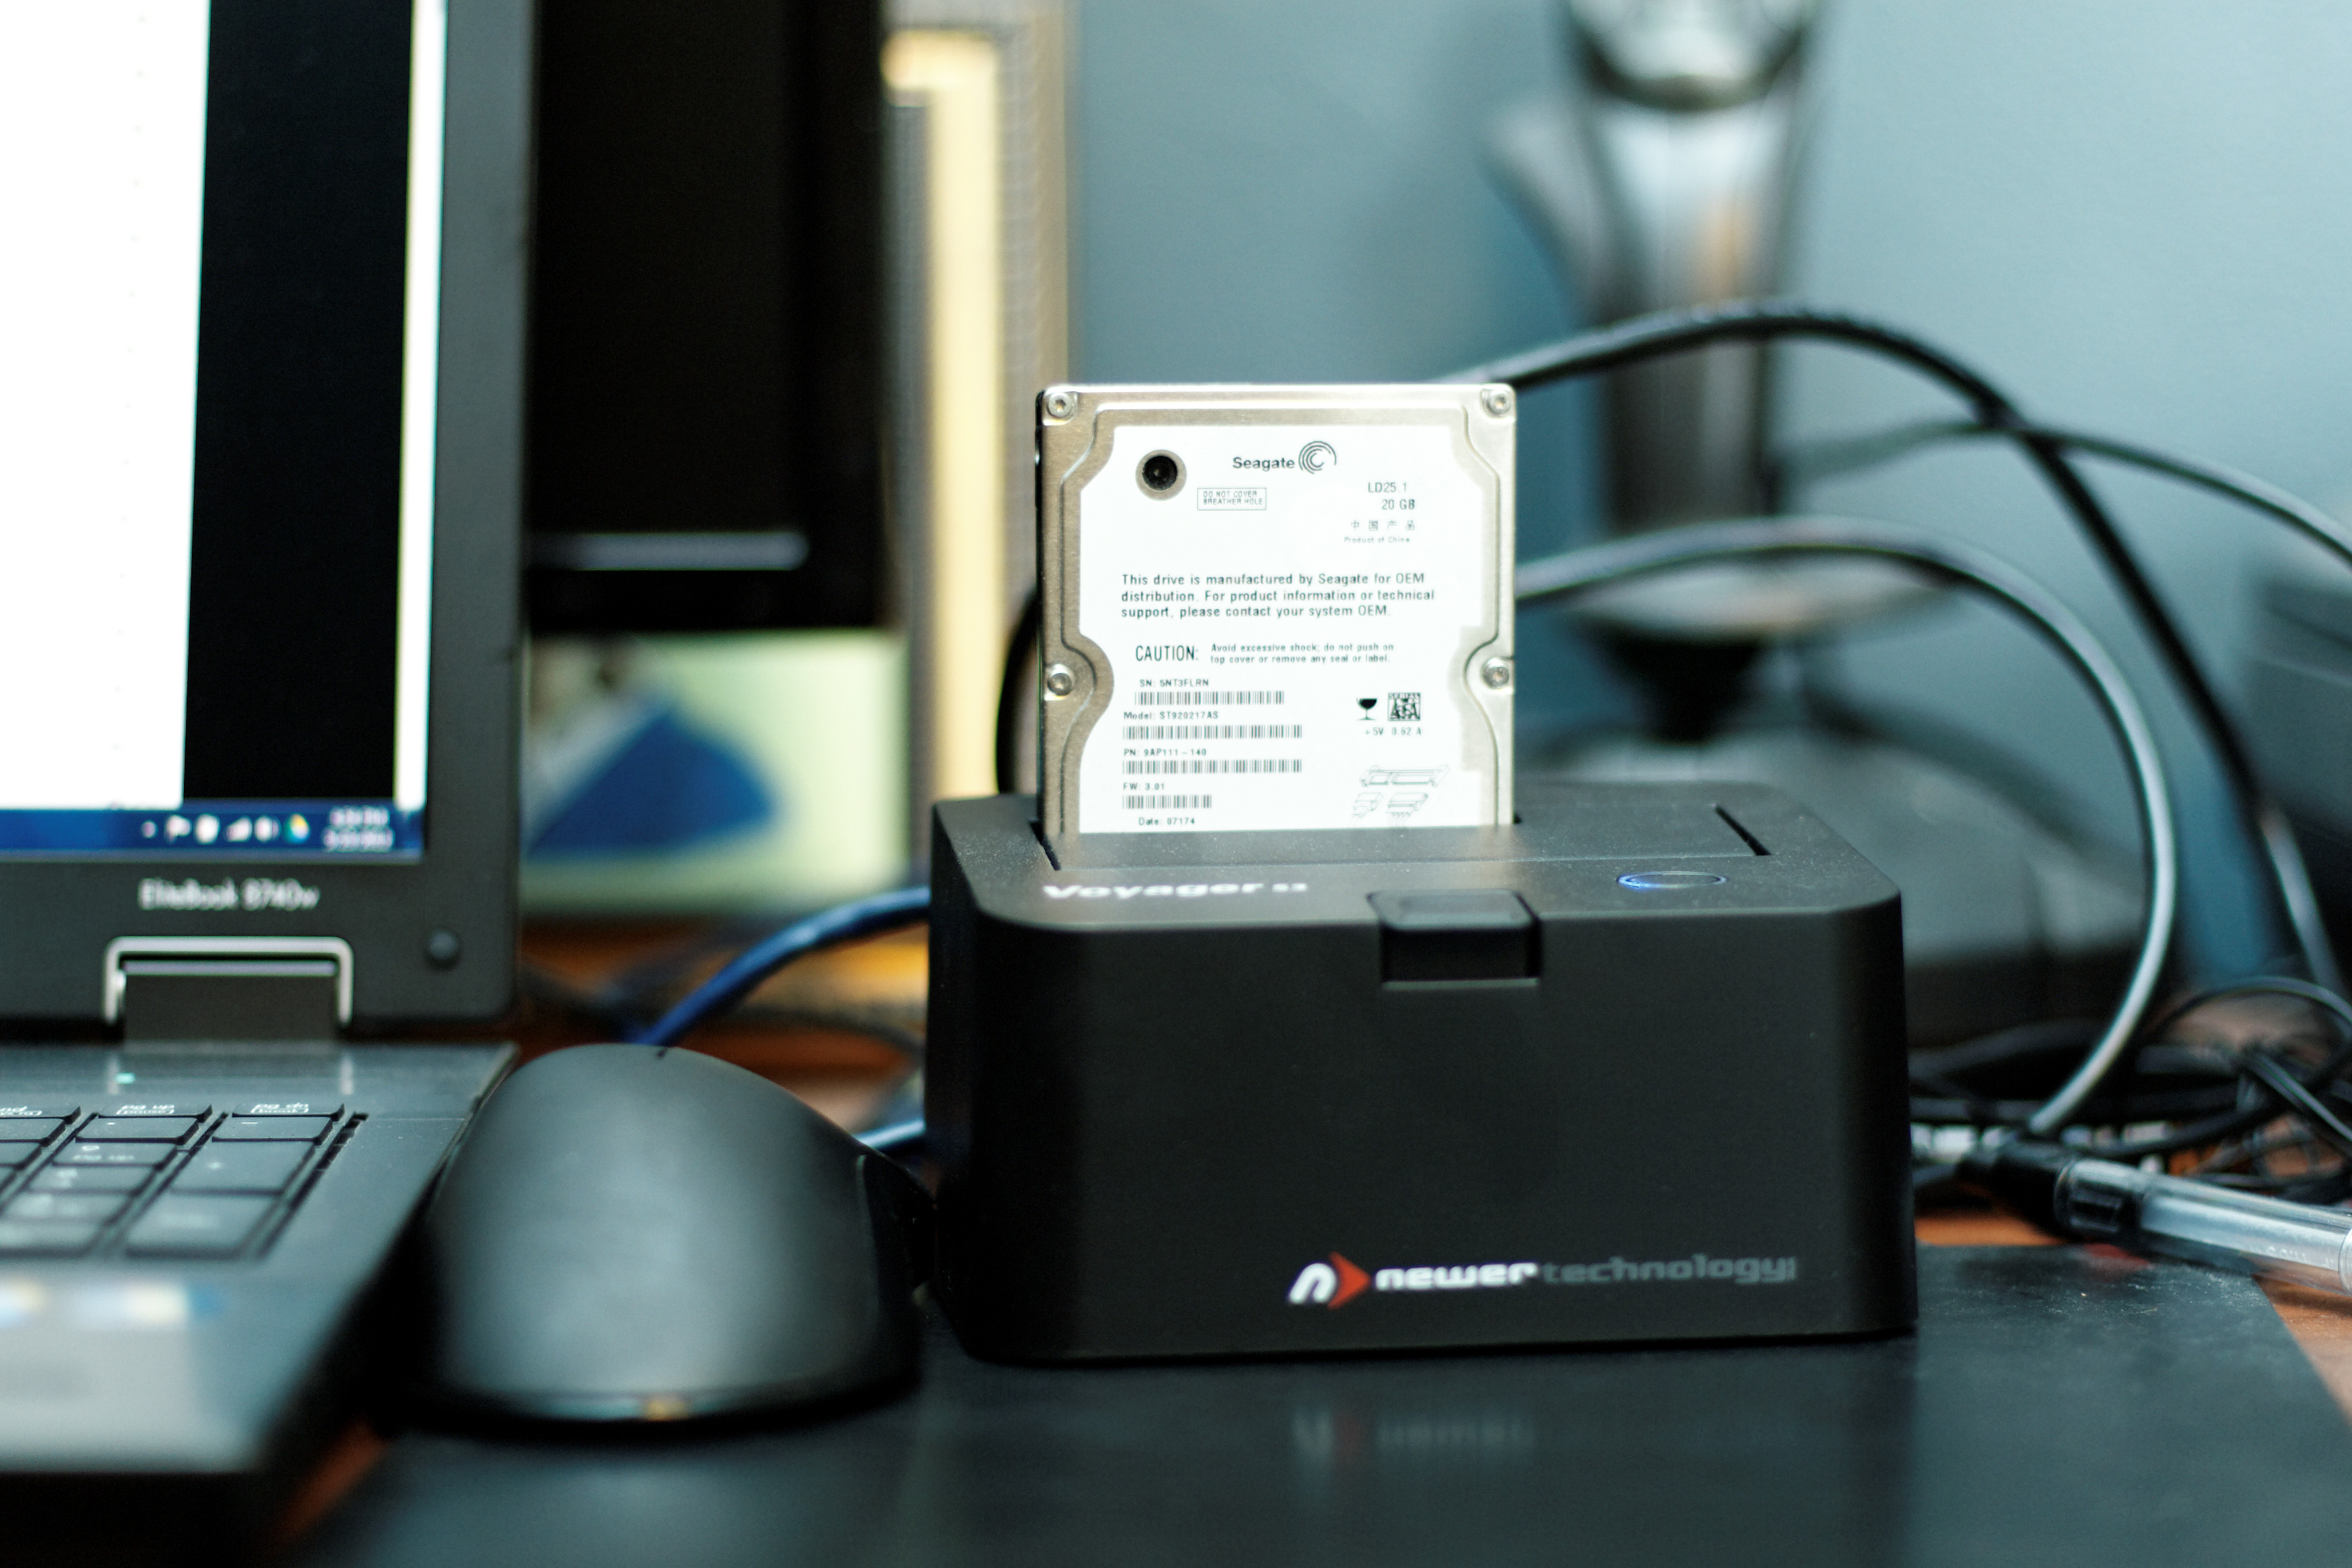 state portable hard h photo ci samsung c b buy drive external n am blue mu ssd solid toaster drives